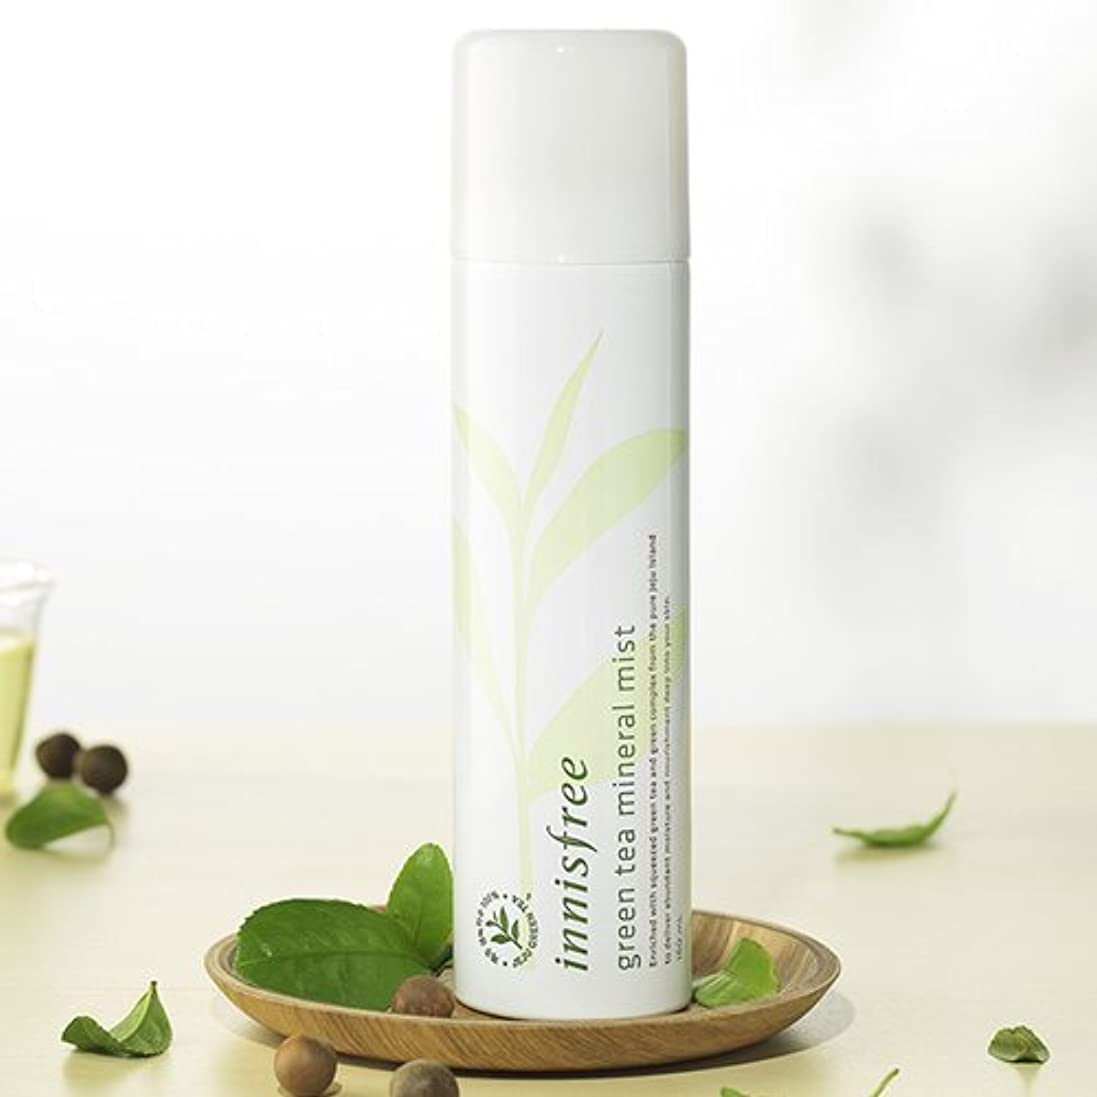 [INNISFREE]イニスフリー緑茶ミネラルミスト150ml green tea mineral mist 150ml [並行輸入品]